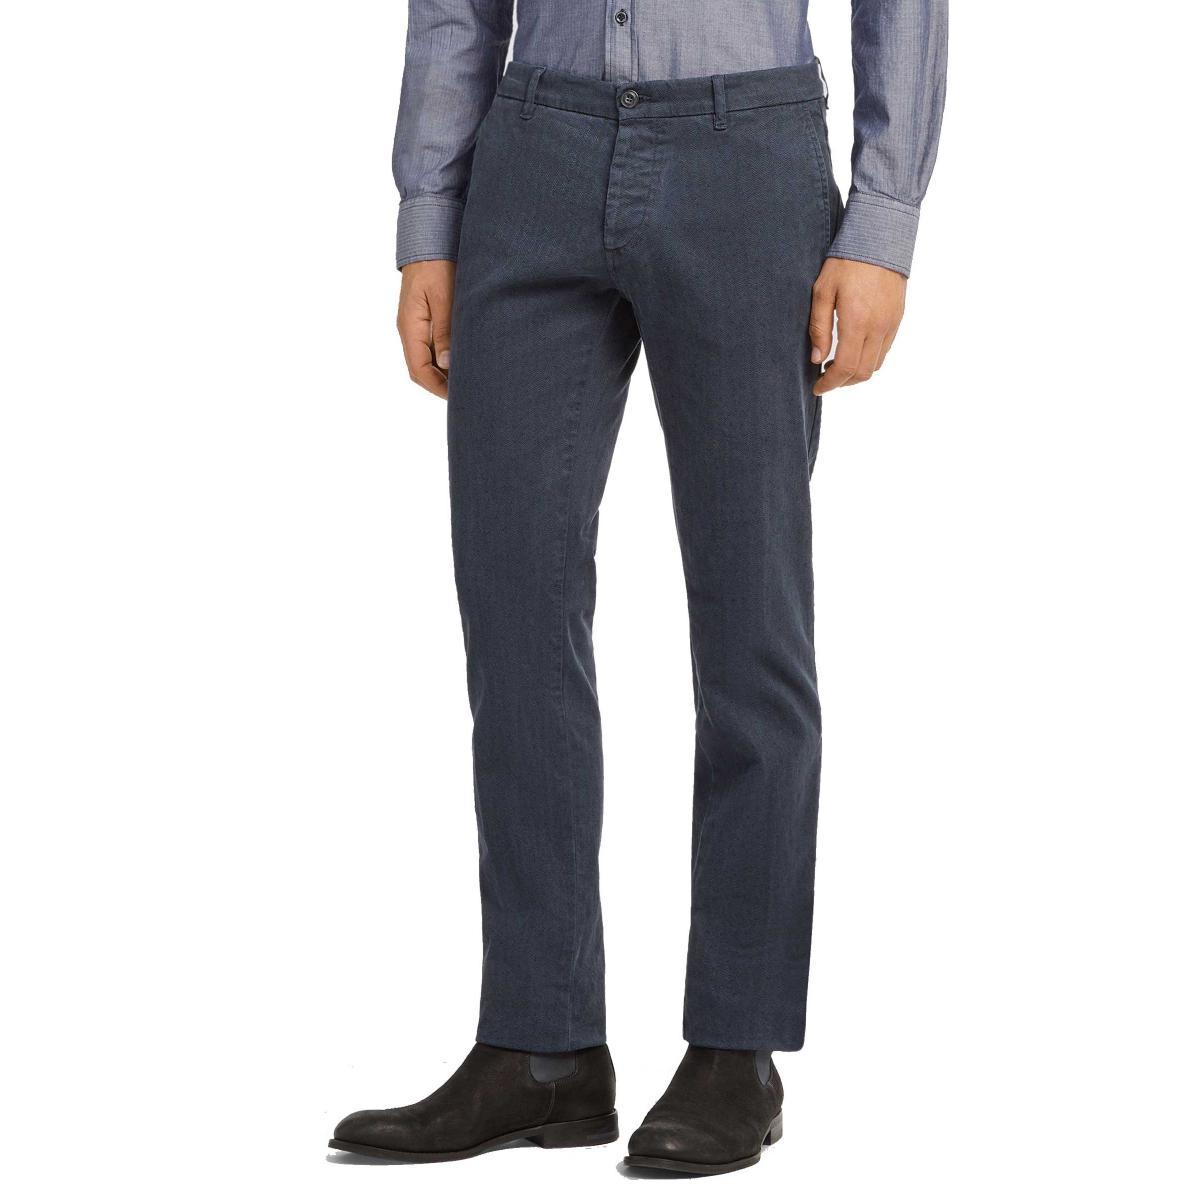 Pantaloni Trussardi 70's fit chino spigati da uomo rif. 52P00008 1T001463